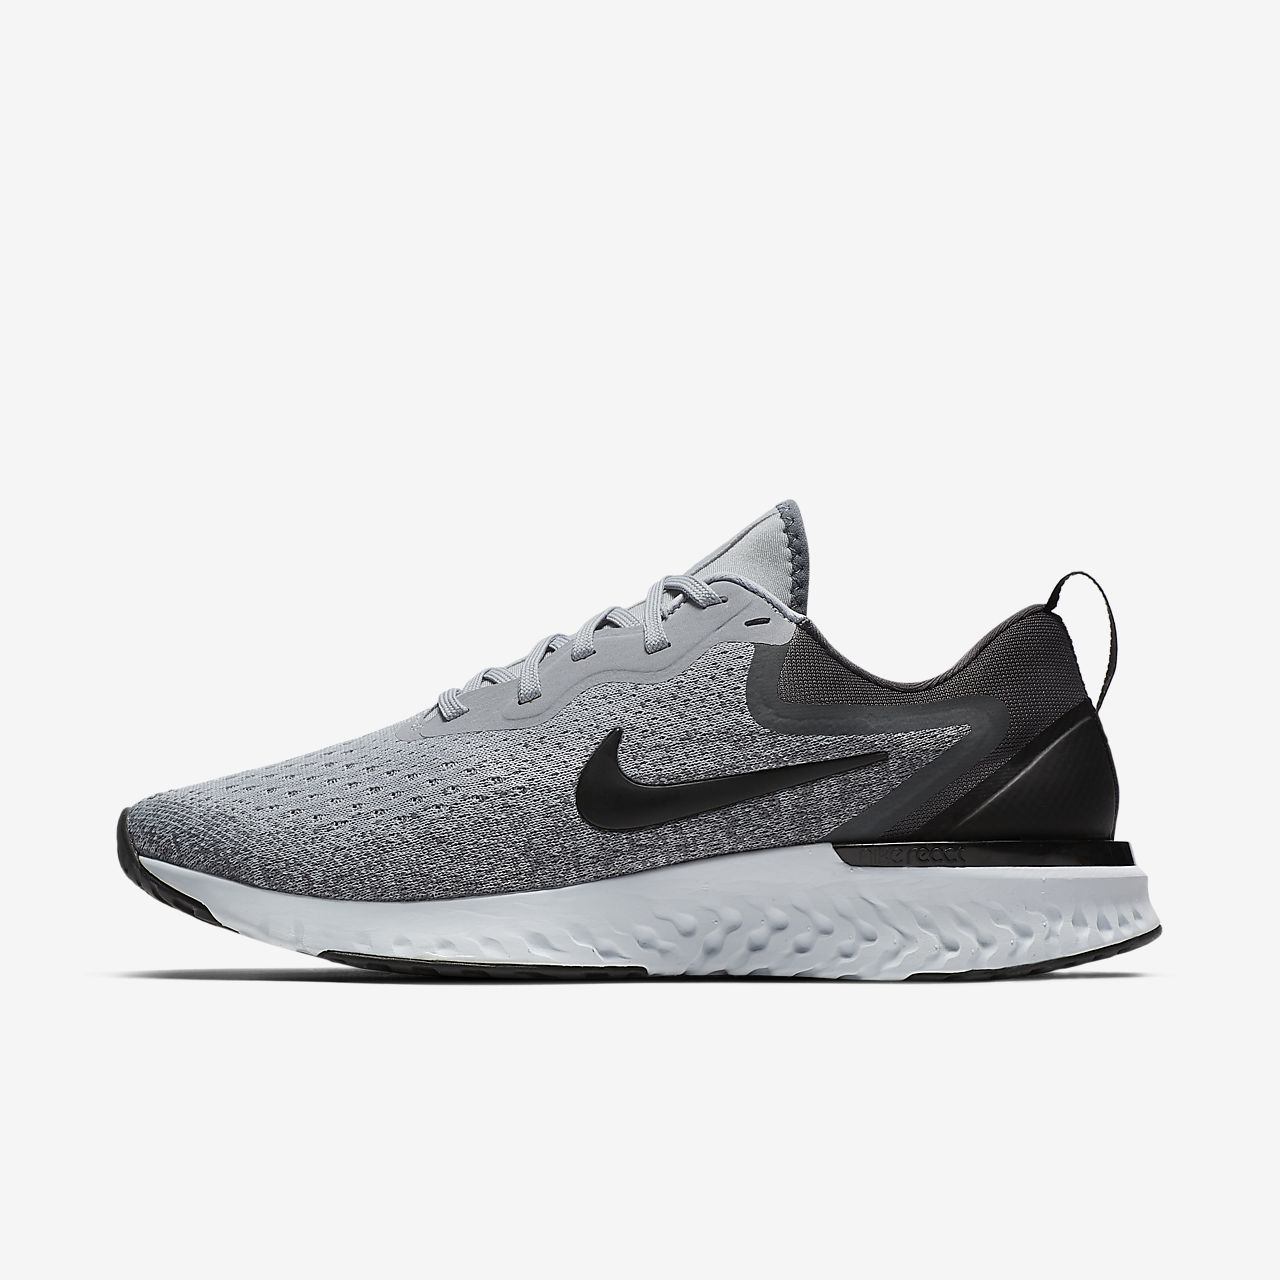 meilleur site web cf6e7 12ad8 Chaussure de running Nike Odyssey React pour Femme